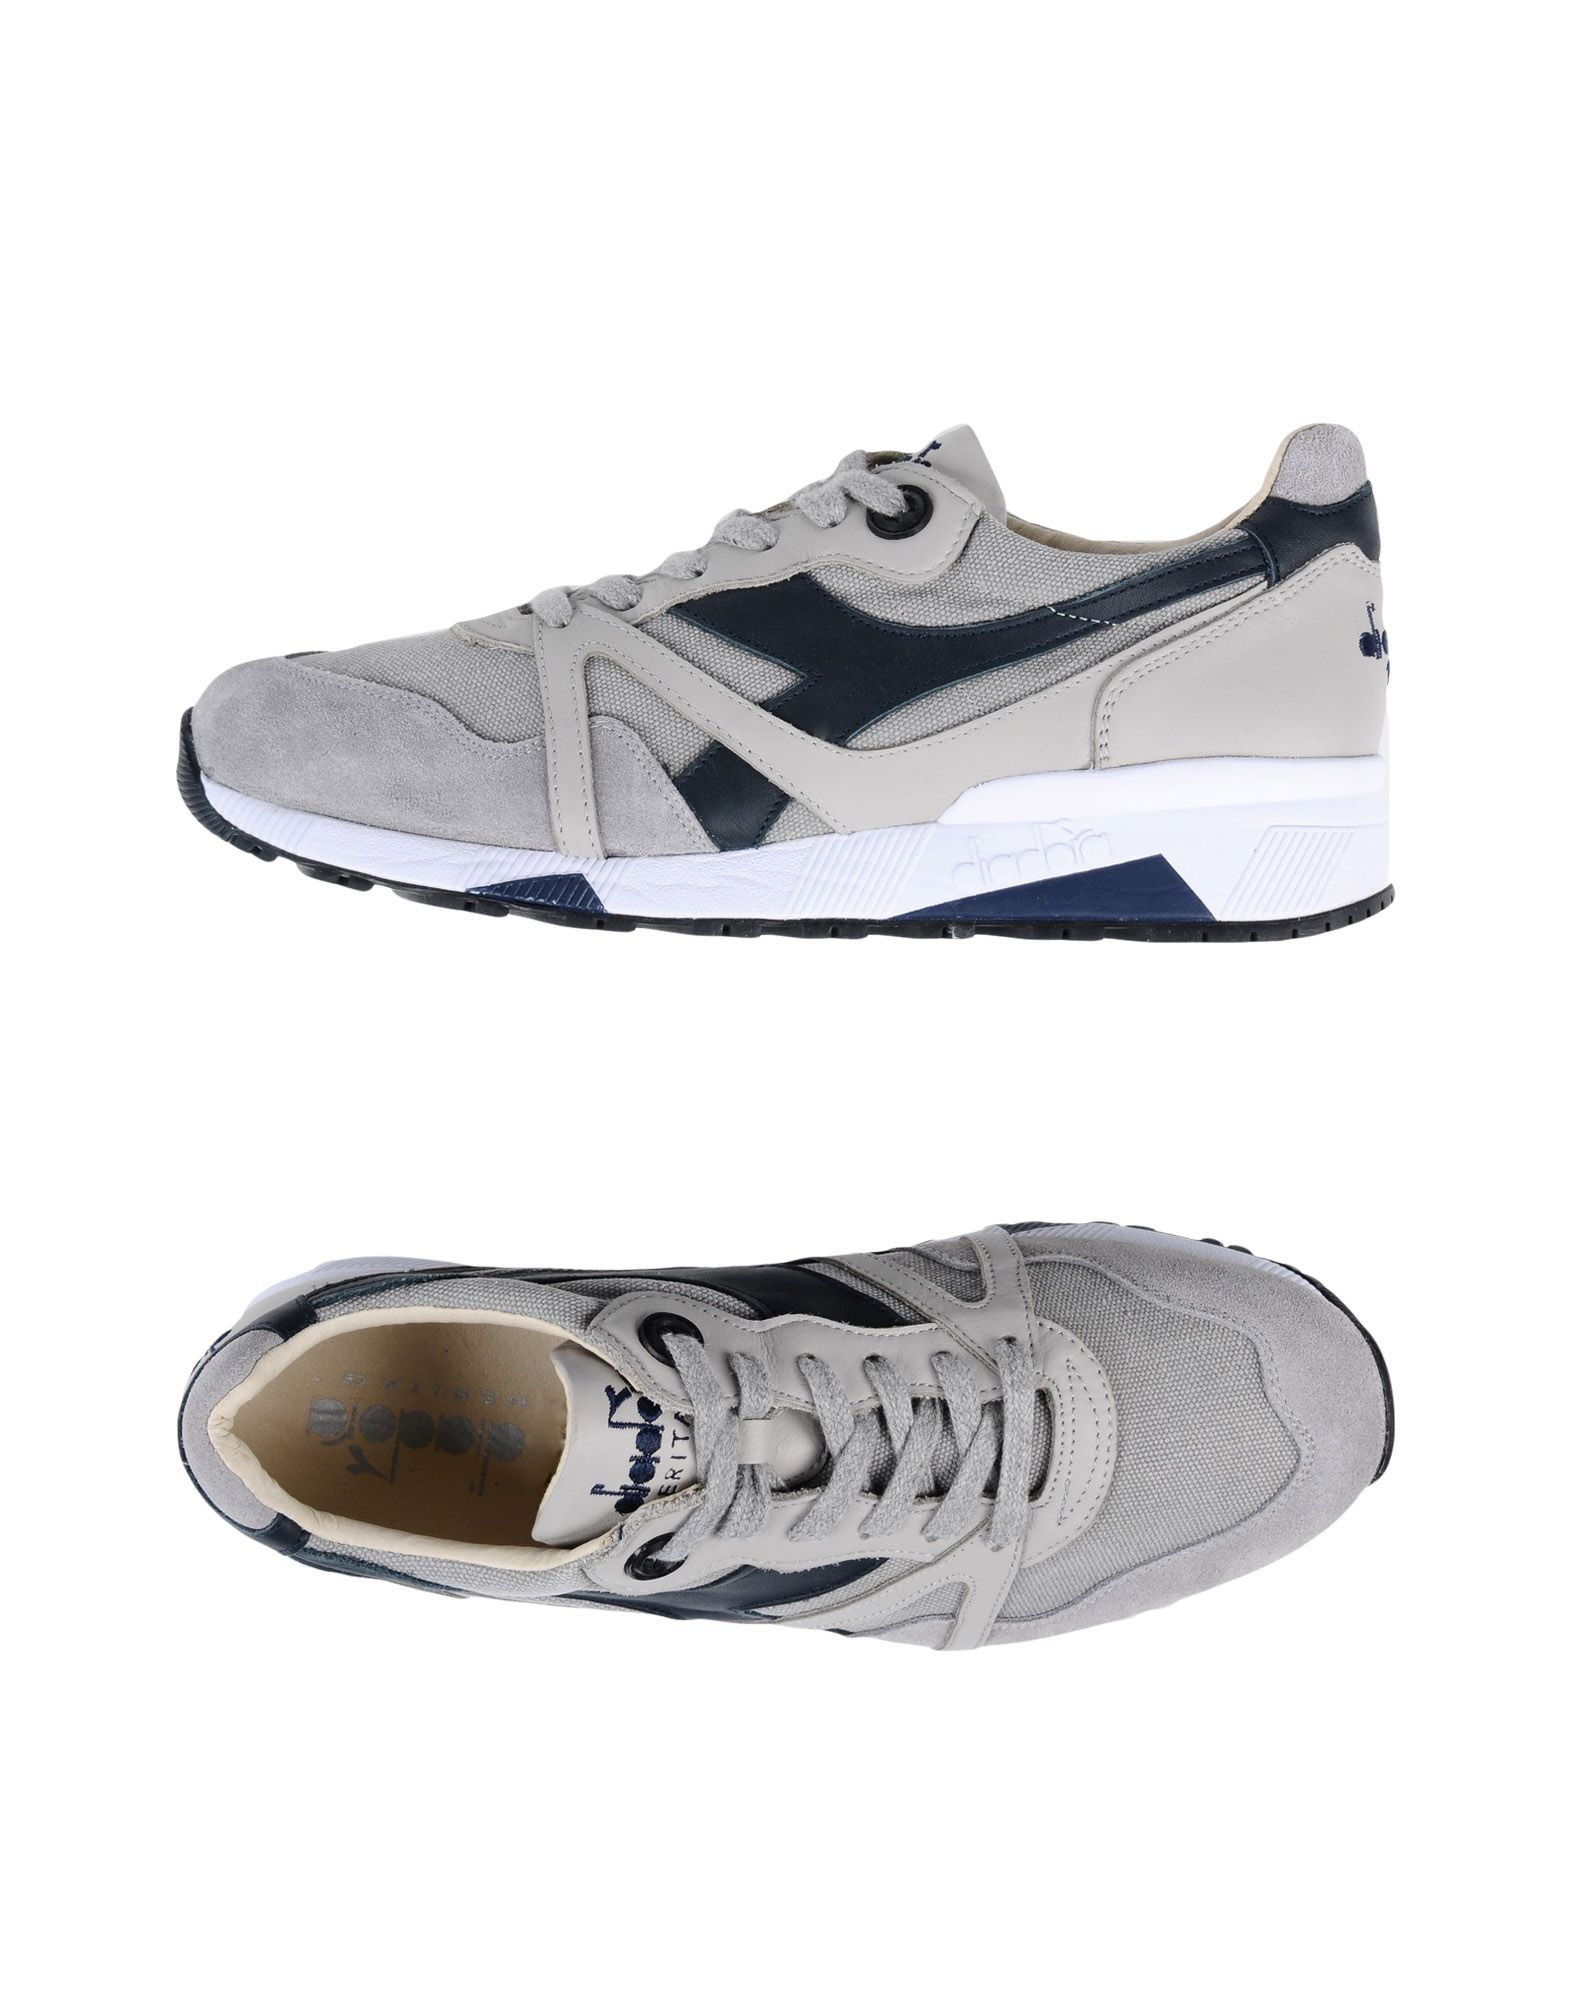 Diadora Heritage N9000 H C Men Sw - Sneakers - Men C Diadora Heritage Sneakers online on  United Kingdom - 11447191EP 95566e